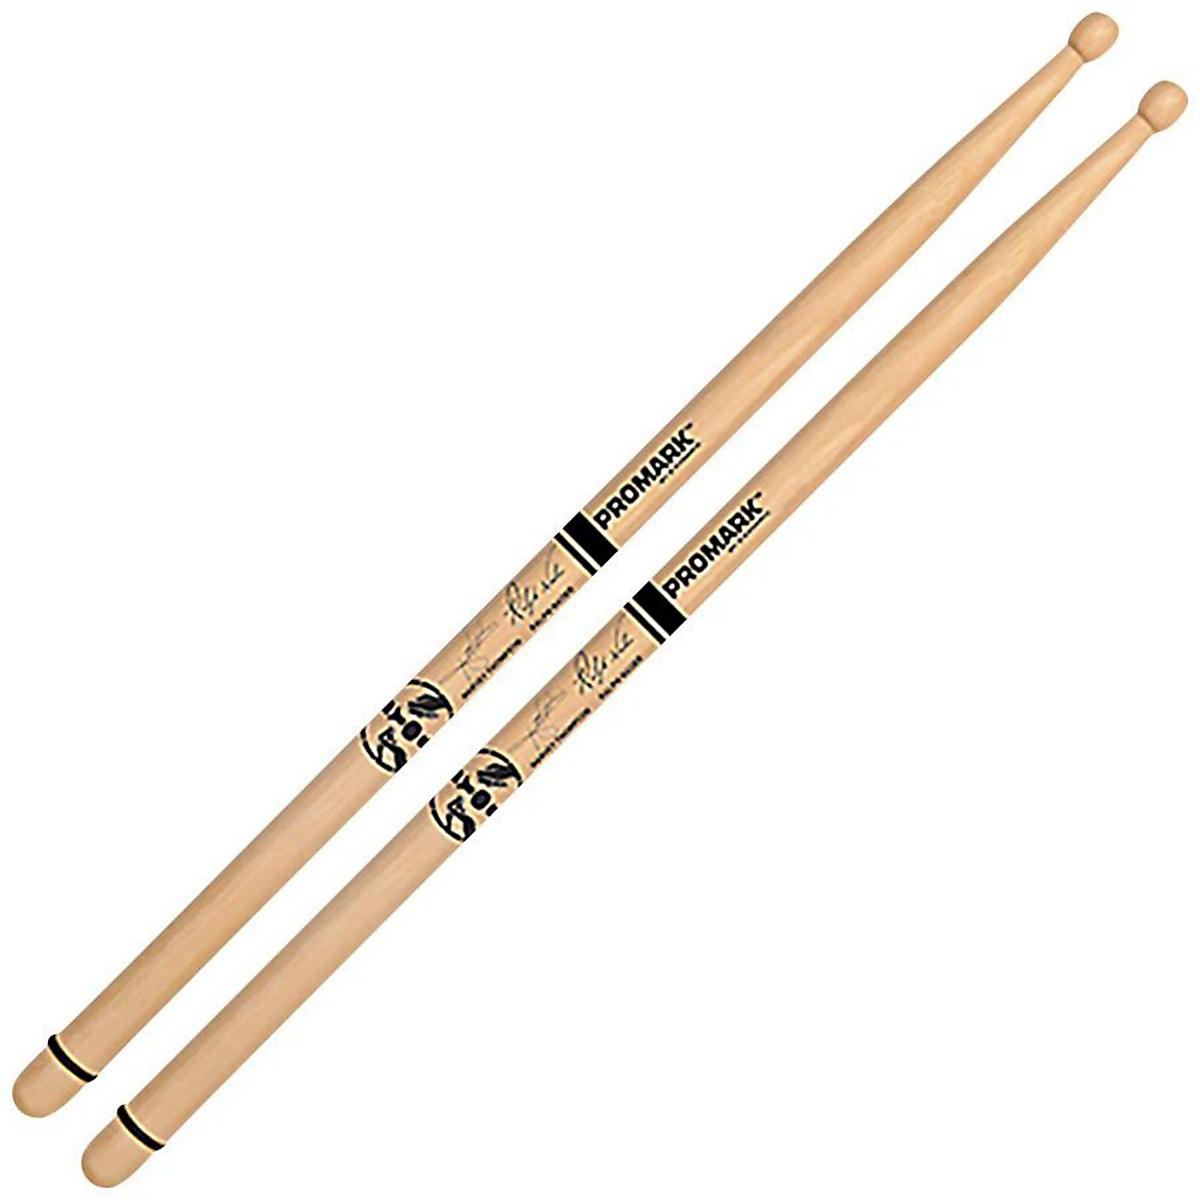 Promark BYOS Hickory Oval Wood Tip Drum Sticks